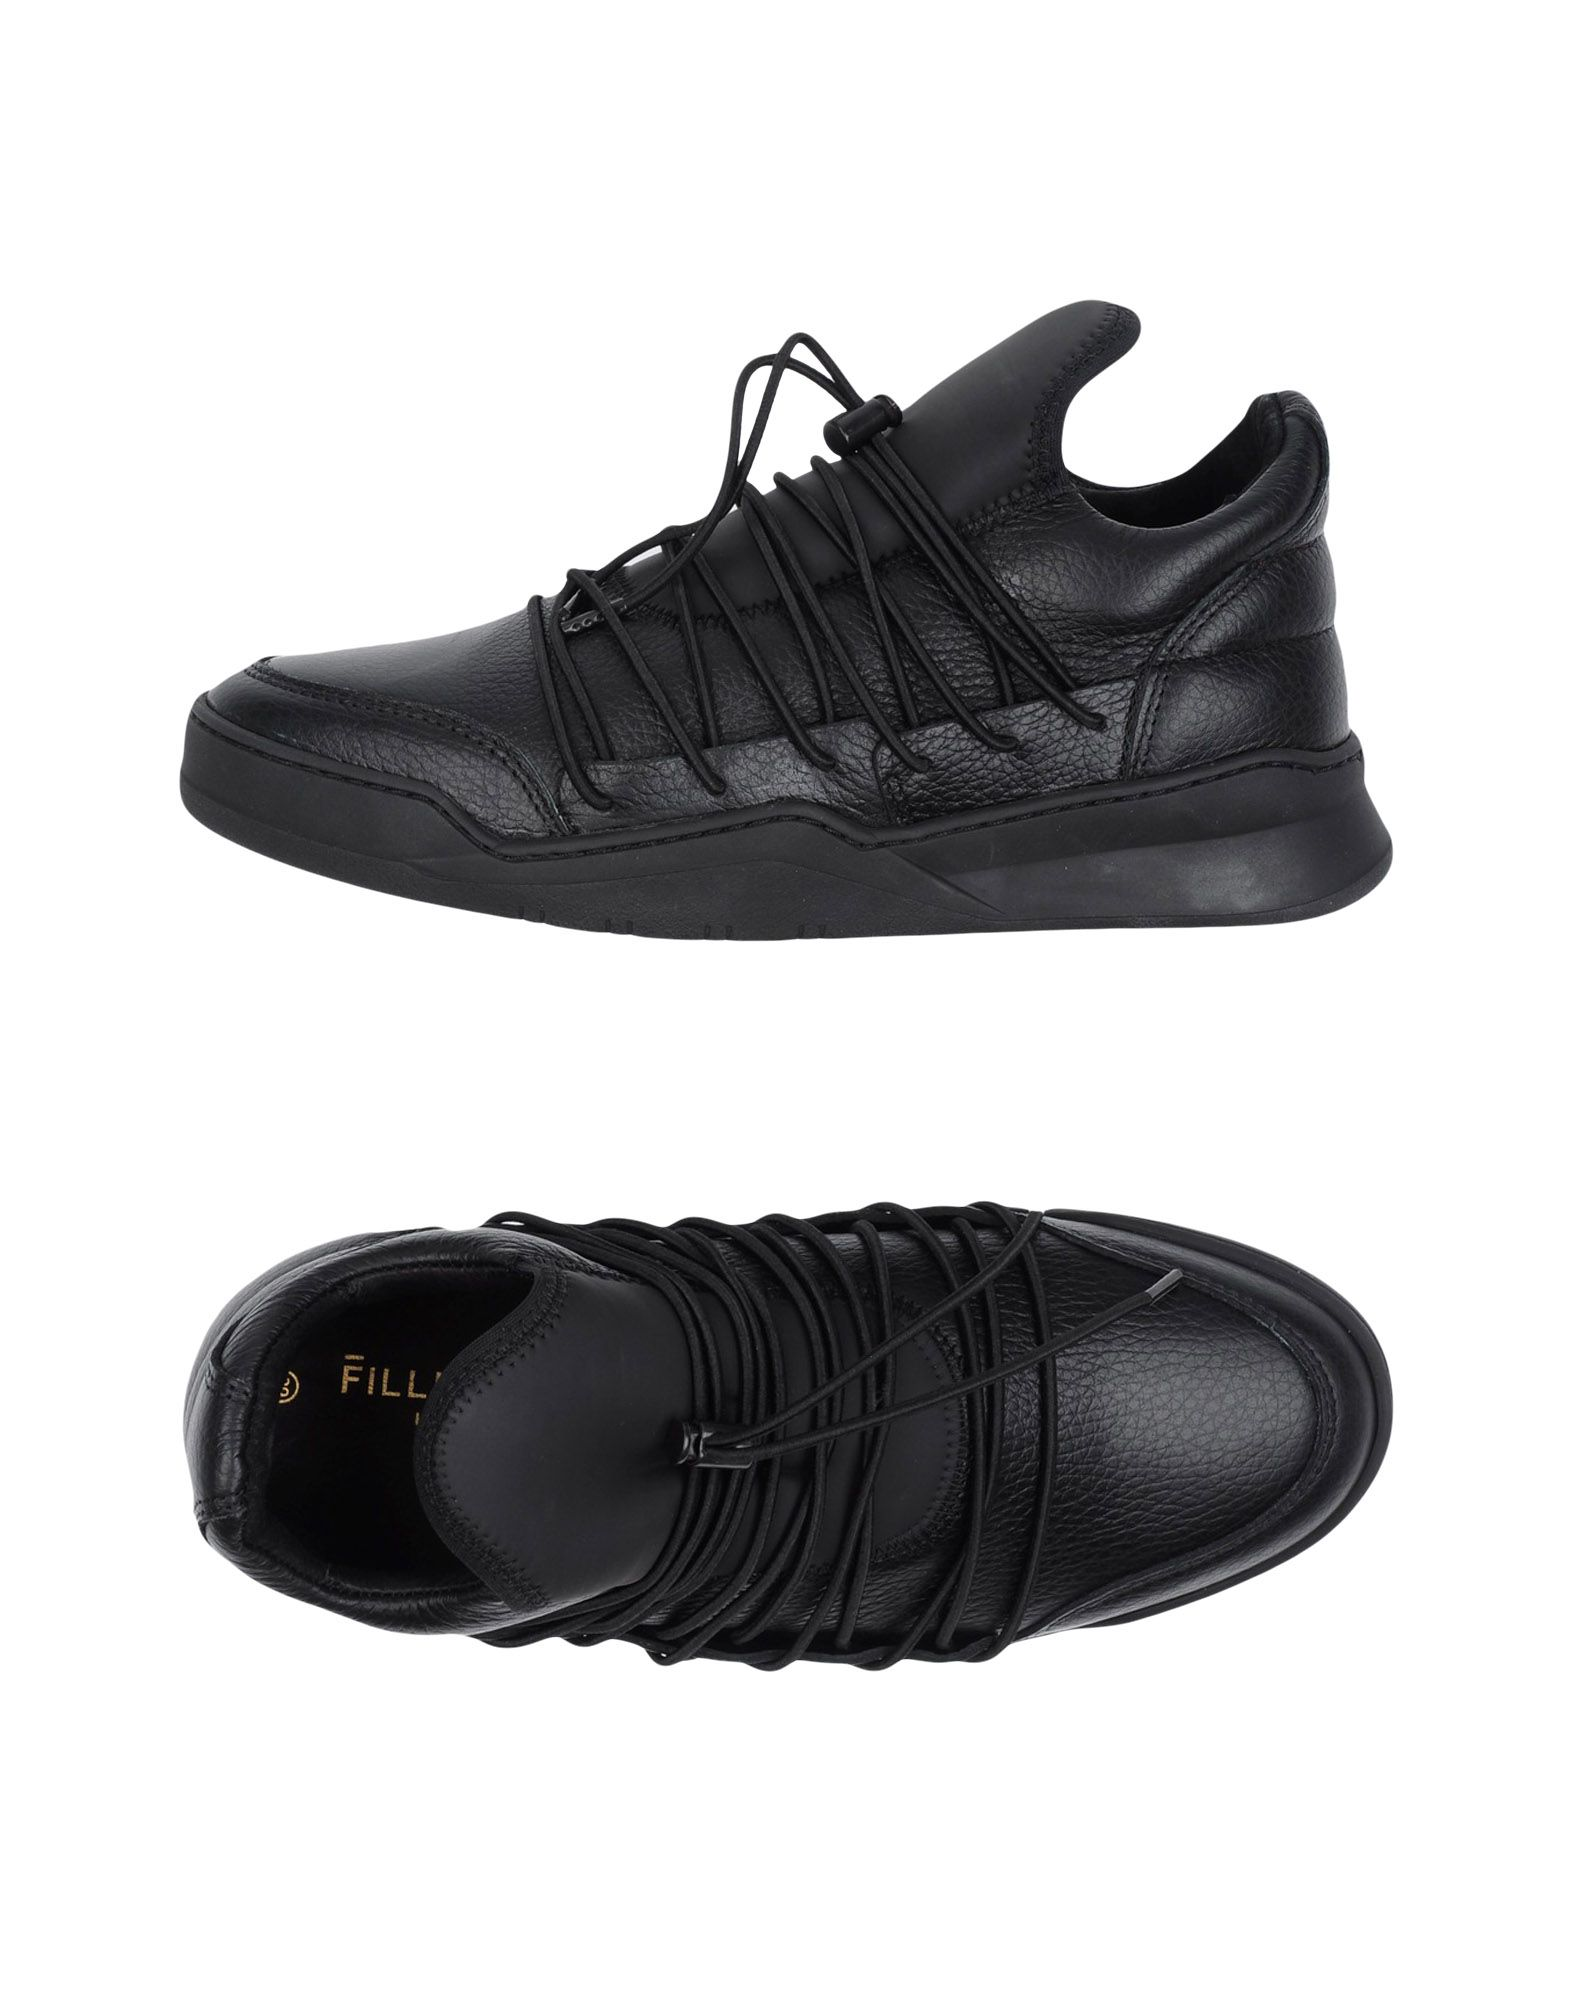 Sneakers Filling Pieces Uomo Uomo Pieces - 11251866HV 5b4662